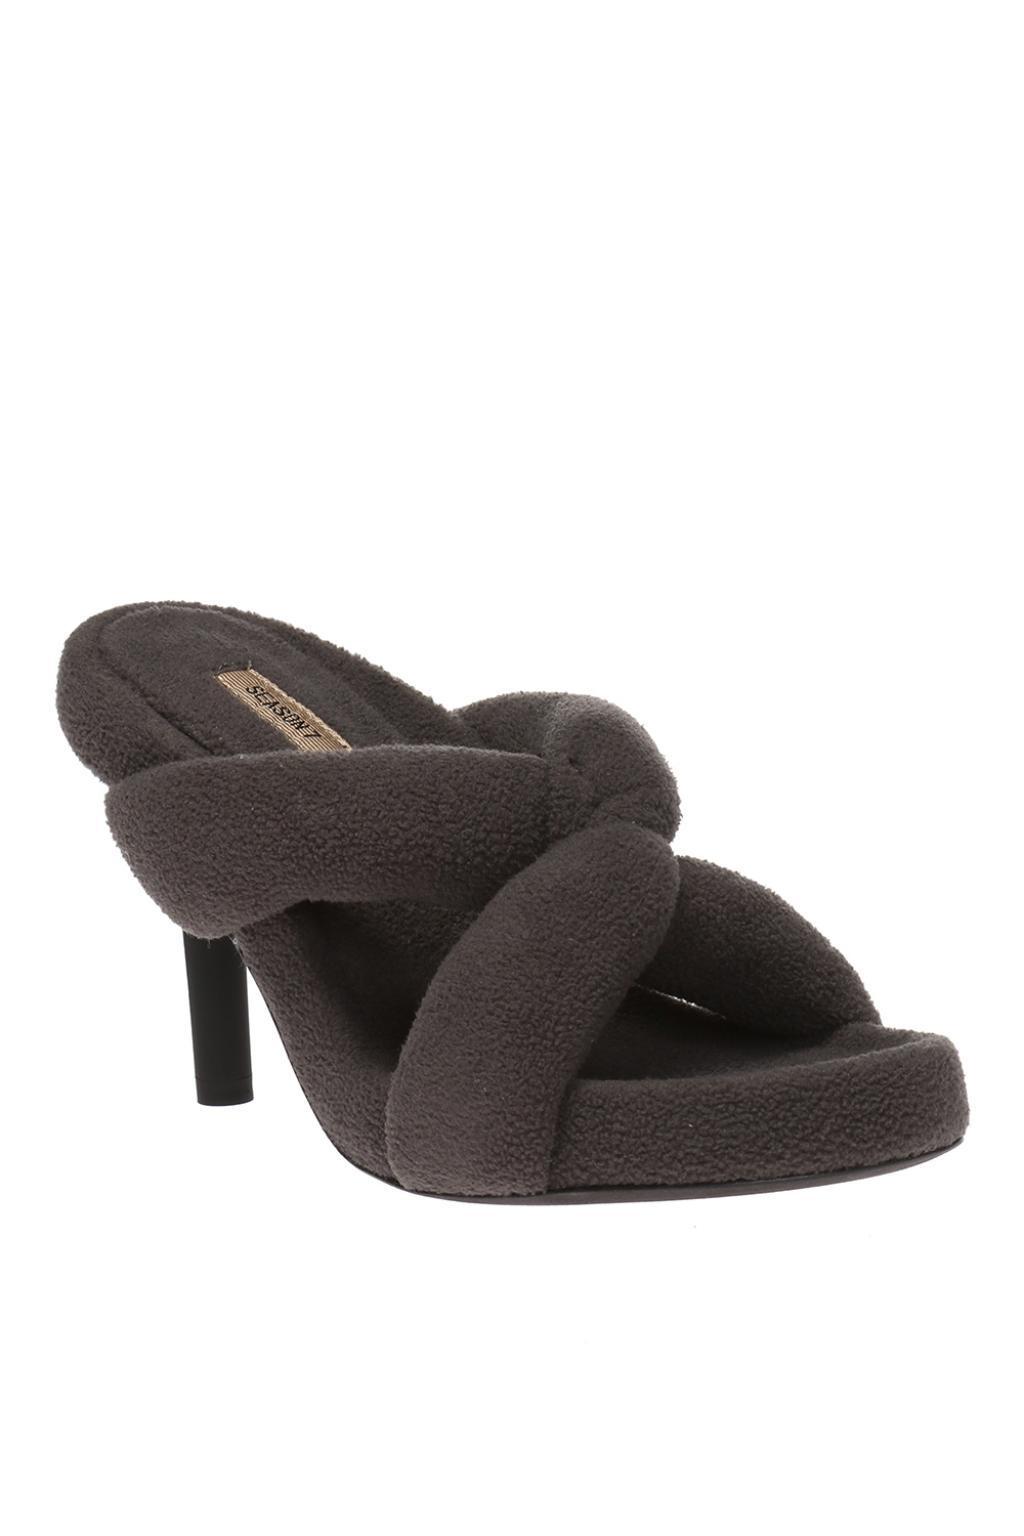 061b829ce93 Yeezy - Gray Stiletto Slippers - Lyst. View fullscreen